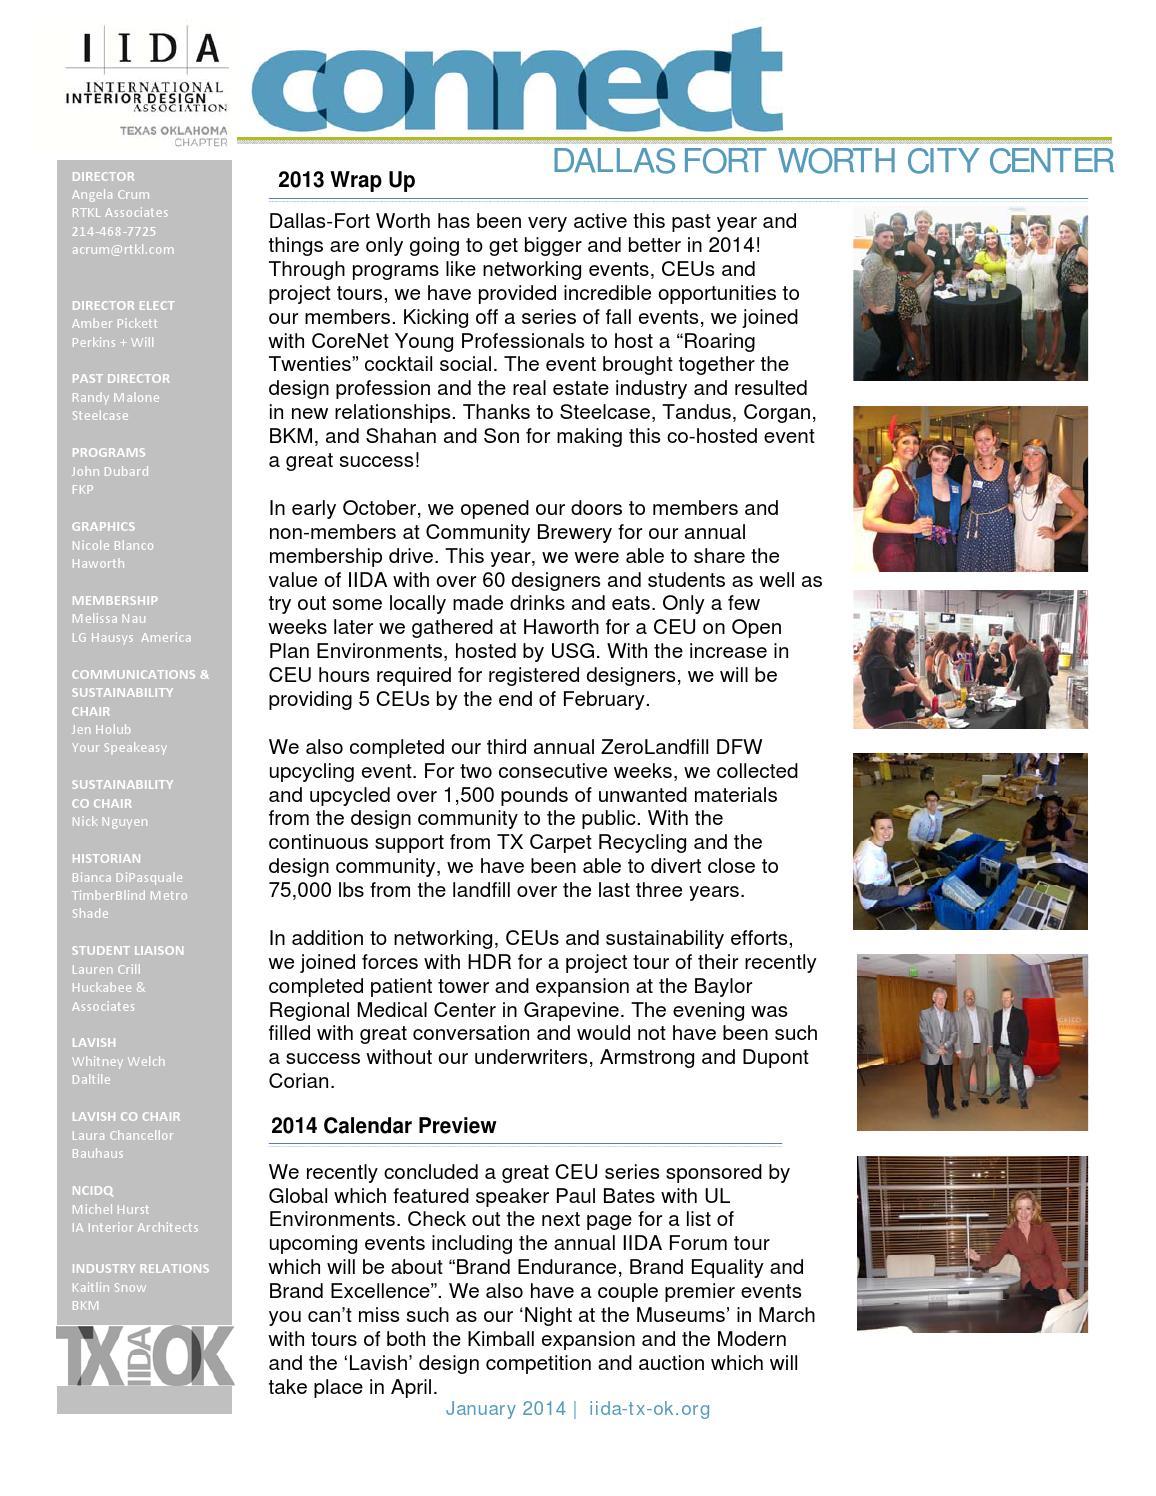 IIDA DFW City Center Connect Newsletter by IIDA Texas ...